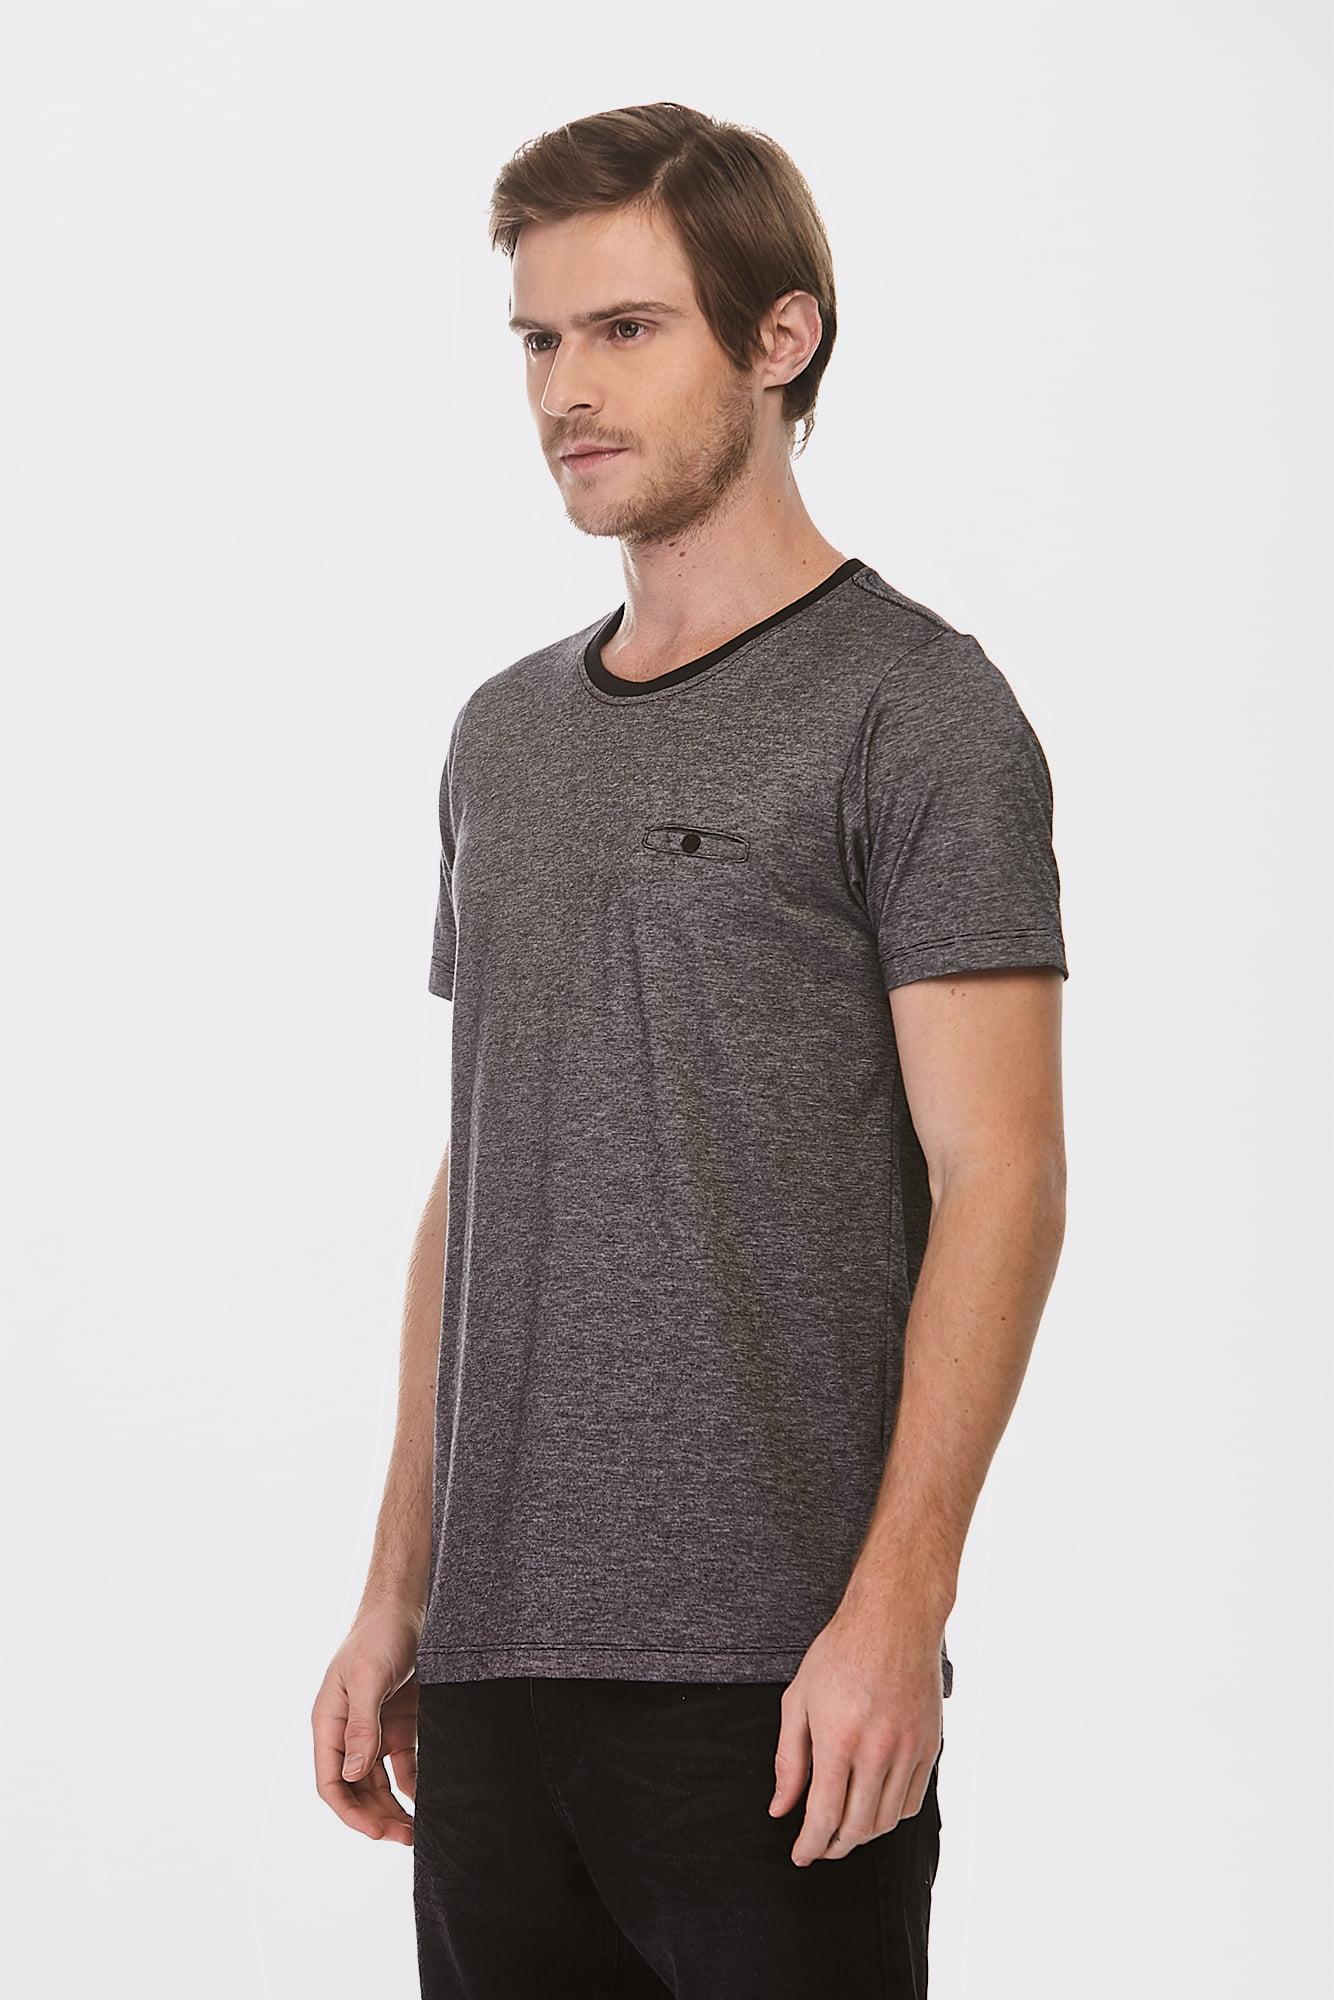 Camiseta Metropolitan Preta